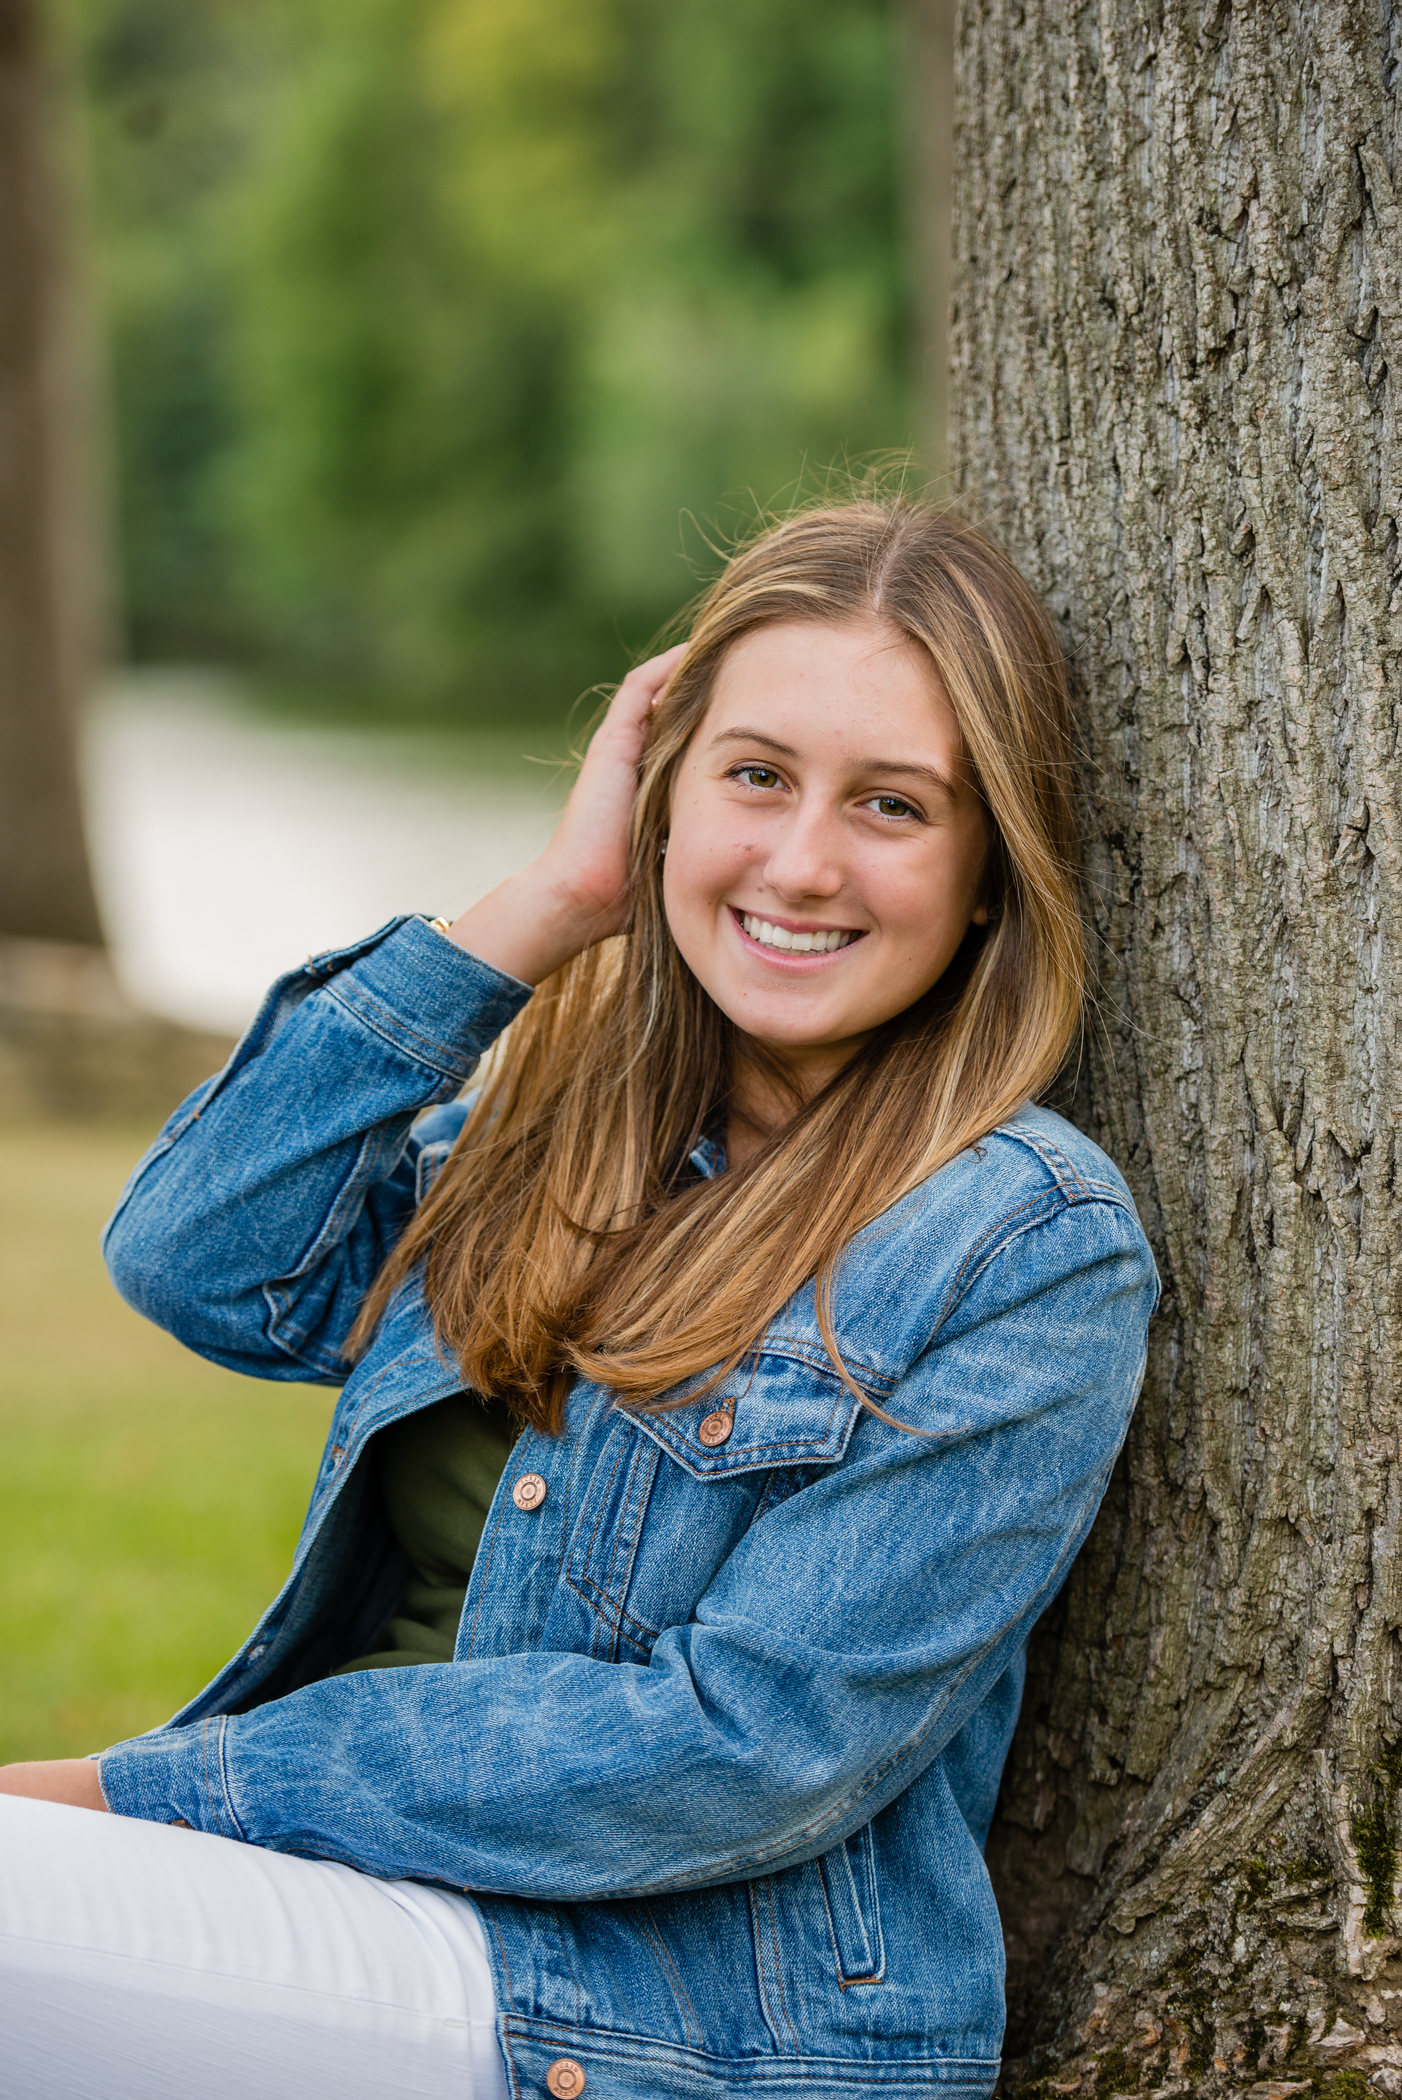 Senior-Portrait-Photographer-7.jpg